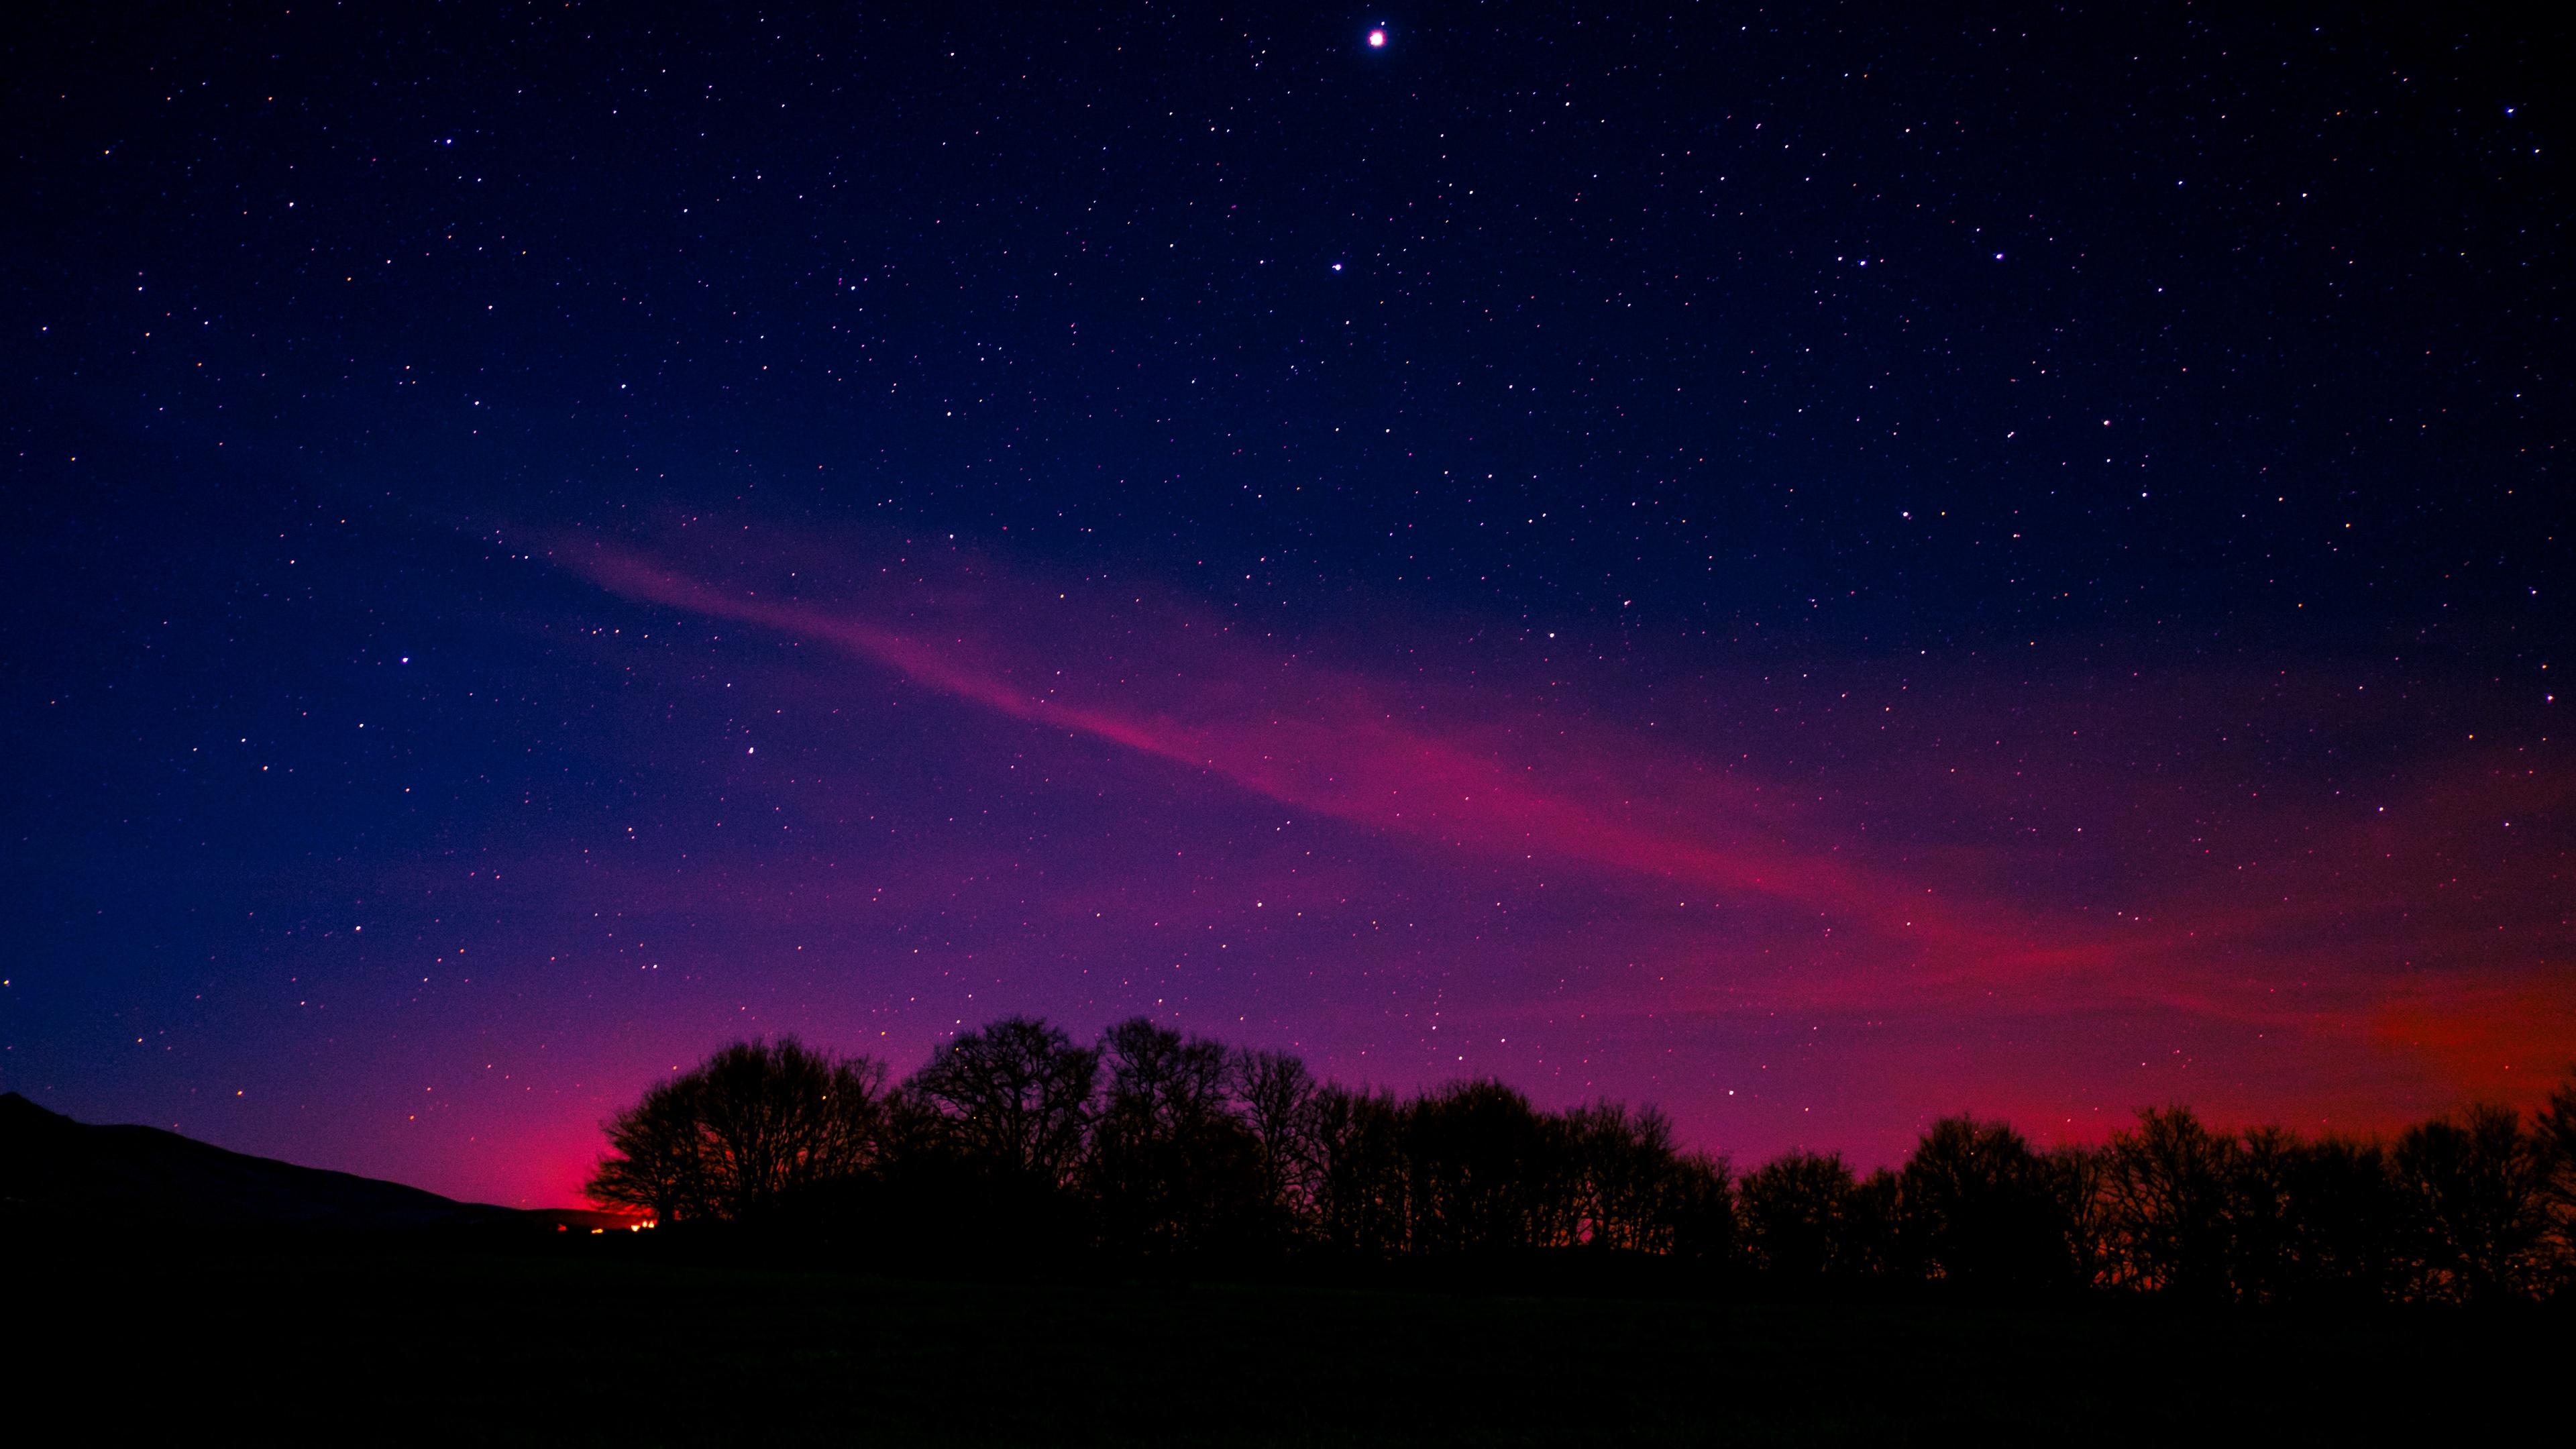 starry sky night trees clouds 4k 1536016889 - starry sky, night, trees, clouds 4k - Trees, starry sky, Night